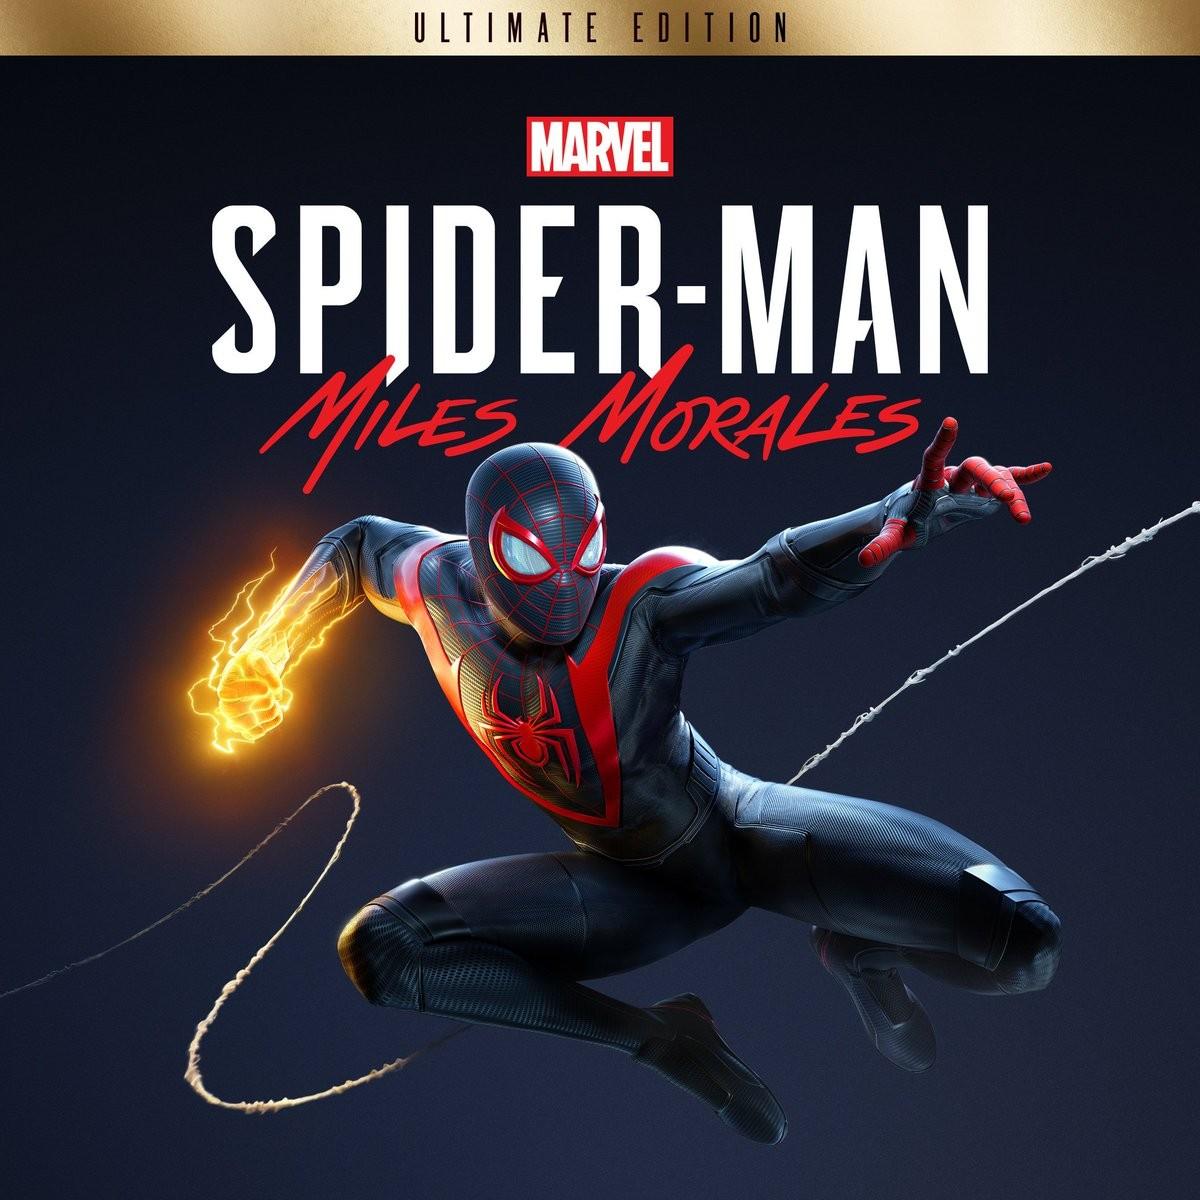 Прокат Marvel's Spider-Man Miles Morales Ultimate Edition | Marvel's Людина-павук Майлз Моралес від 7 днів PS5